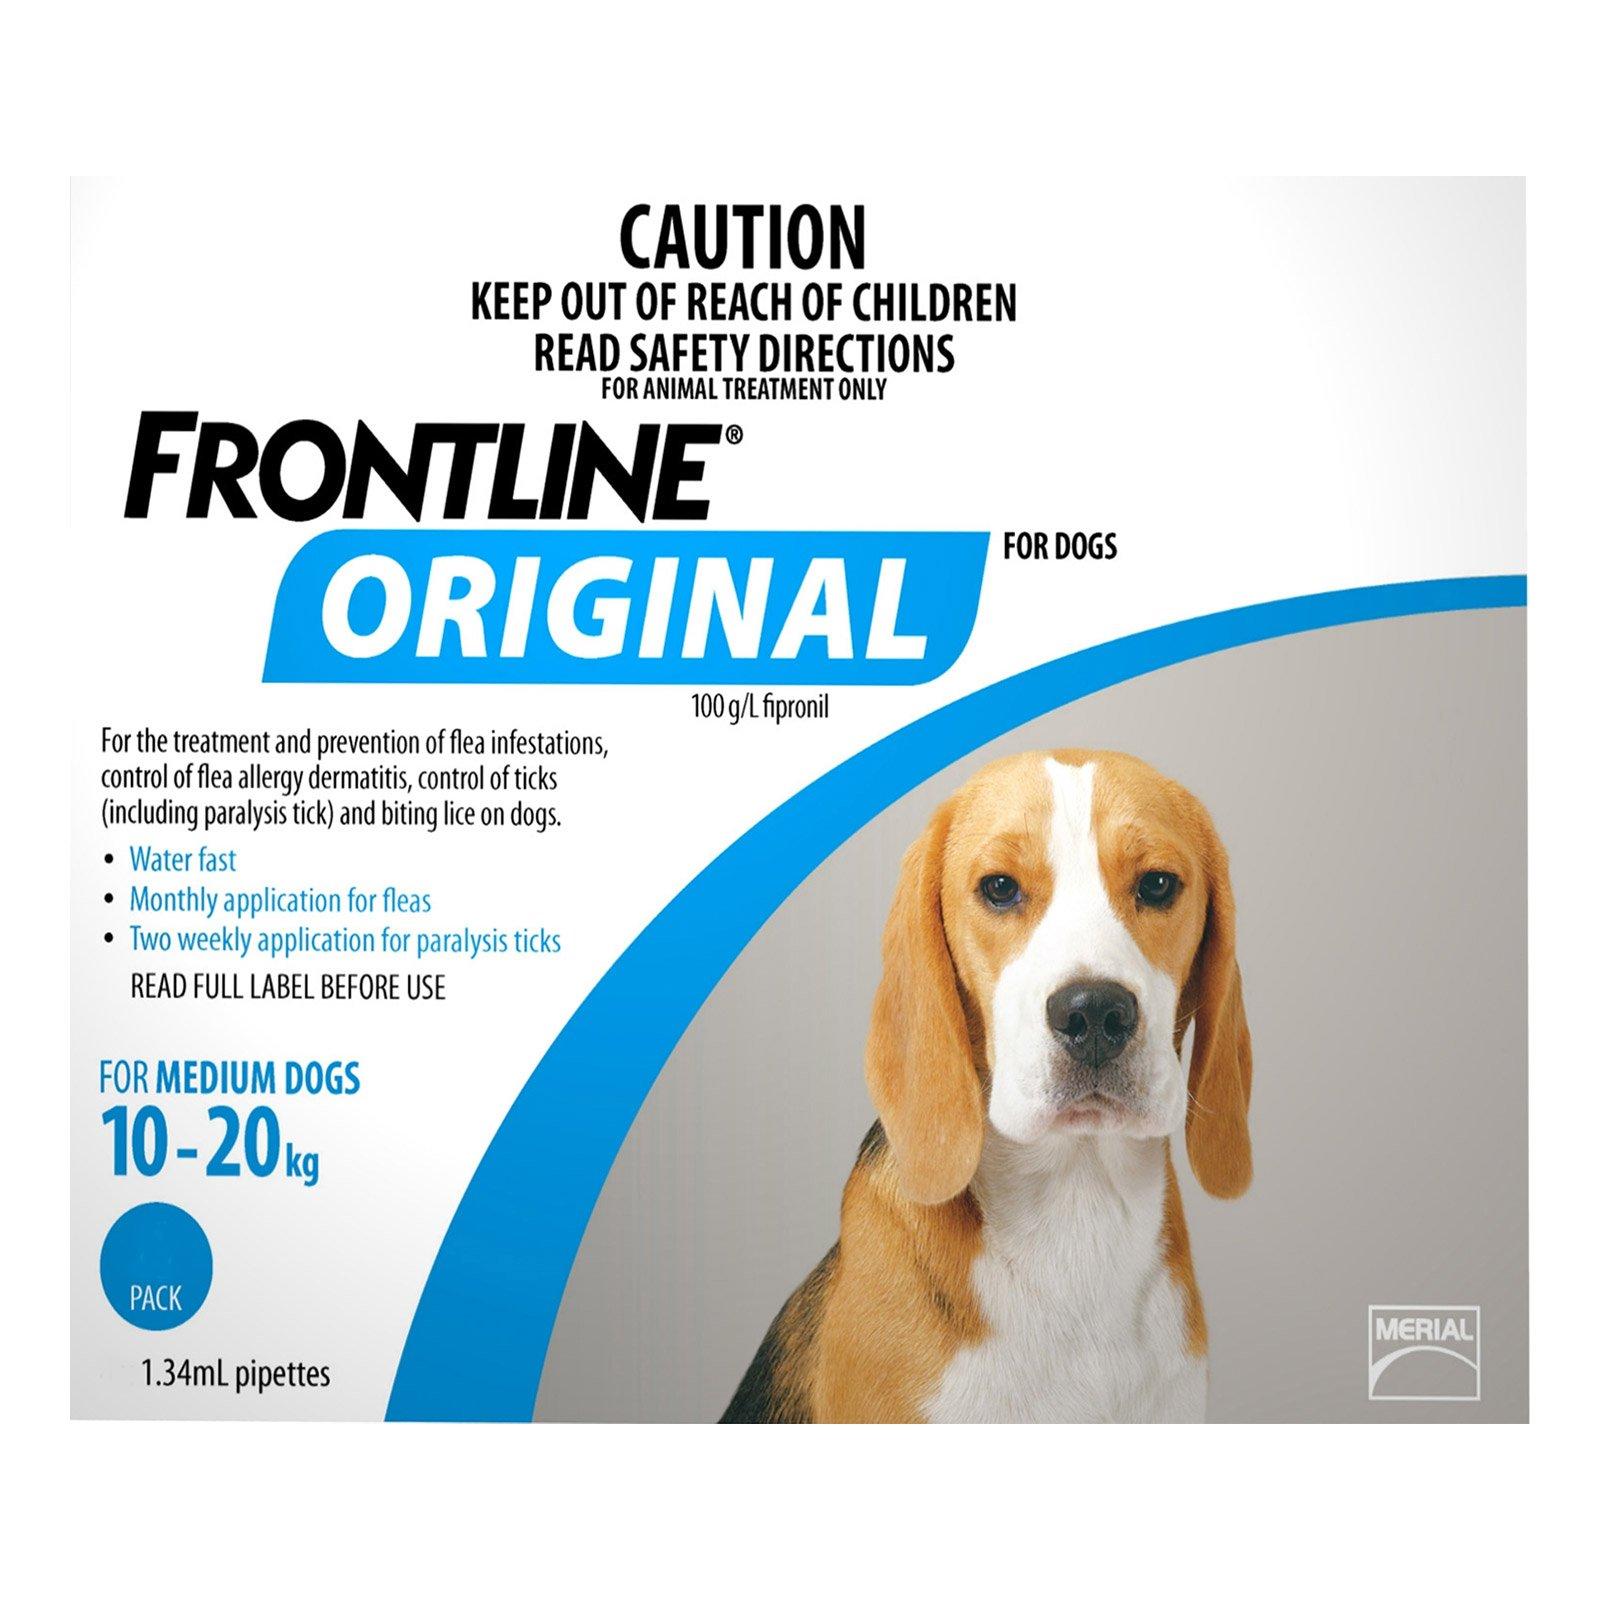 Frontline Original